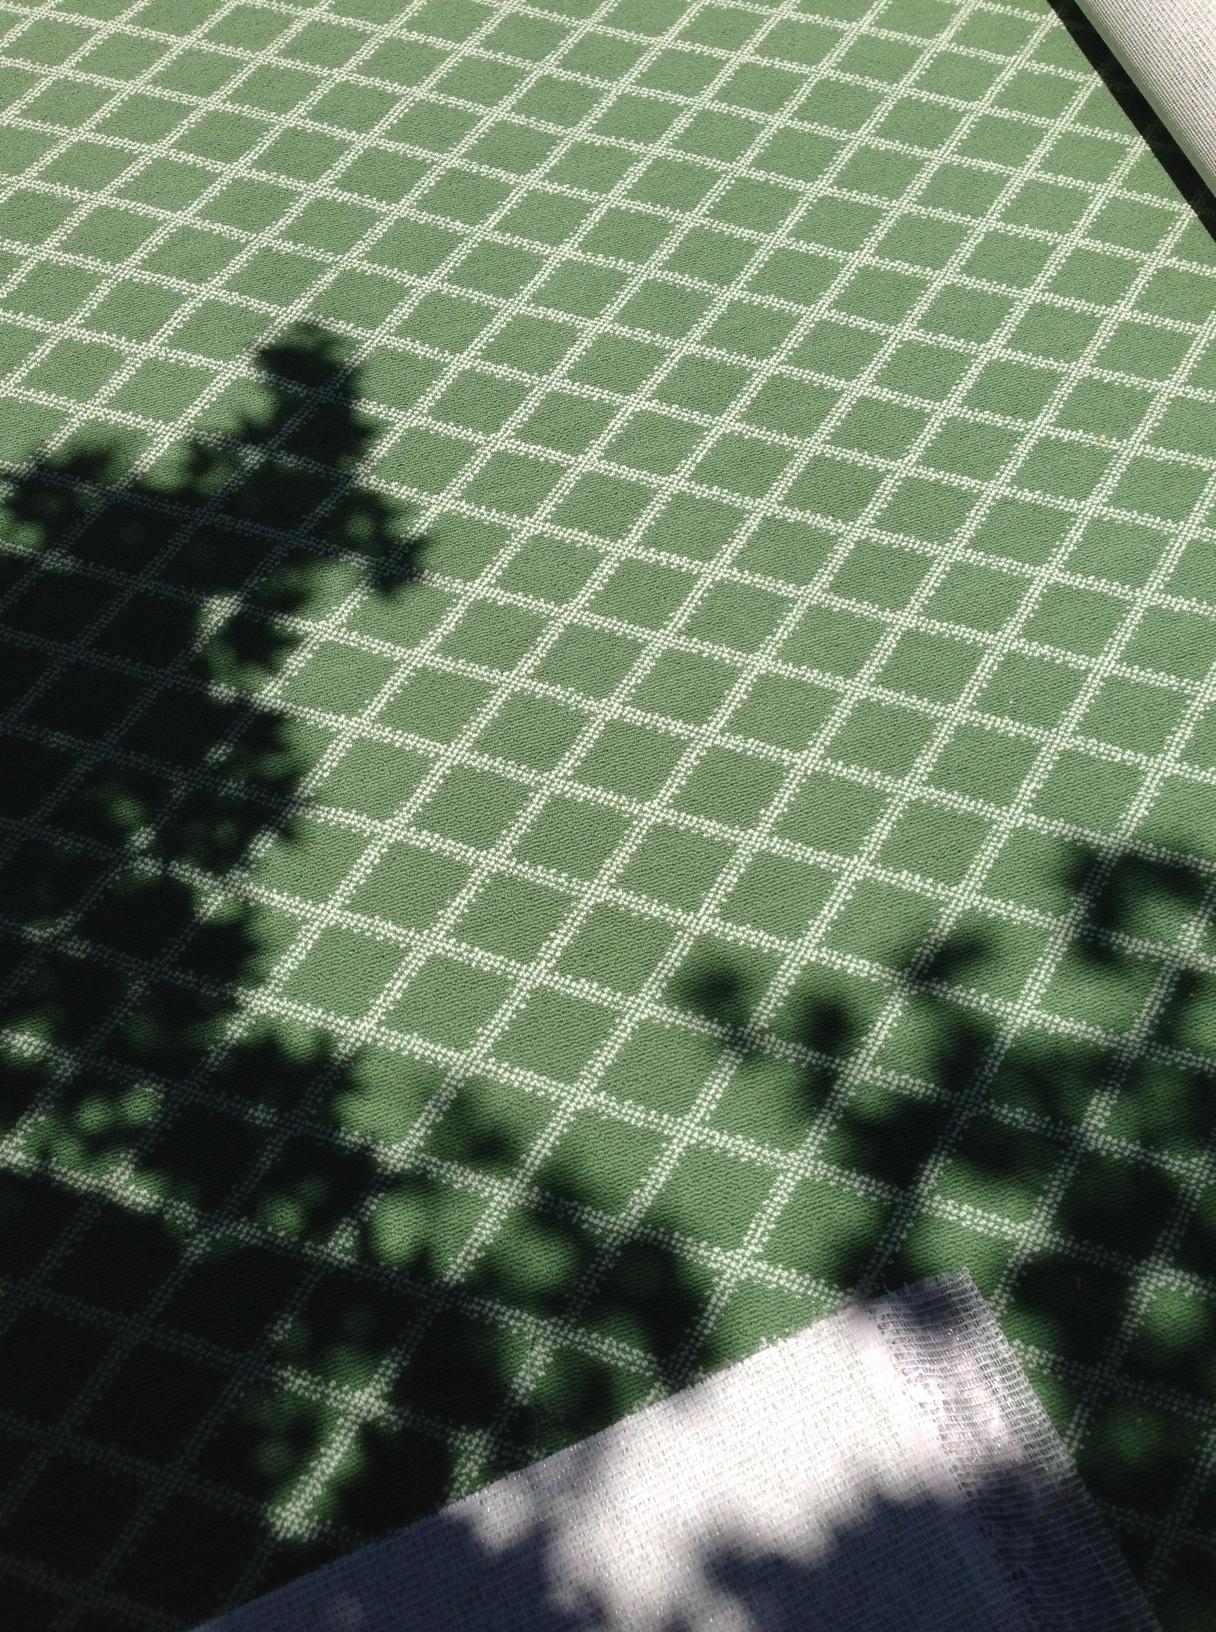 Green Trellis Carpet | via Interiors for Families